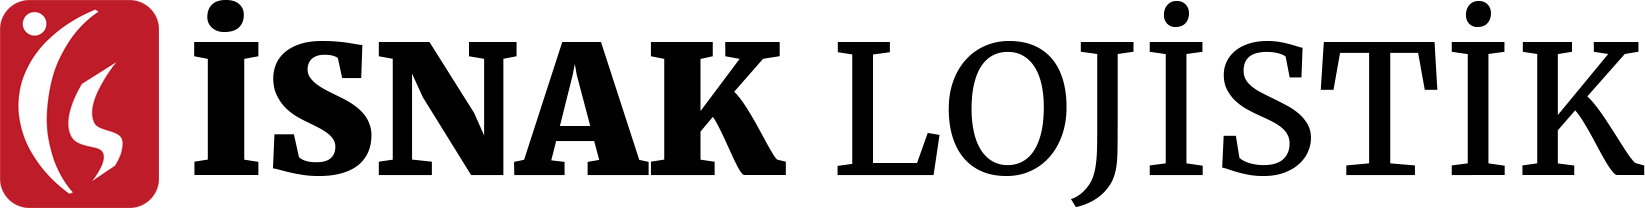 isnak-logo-2